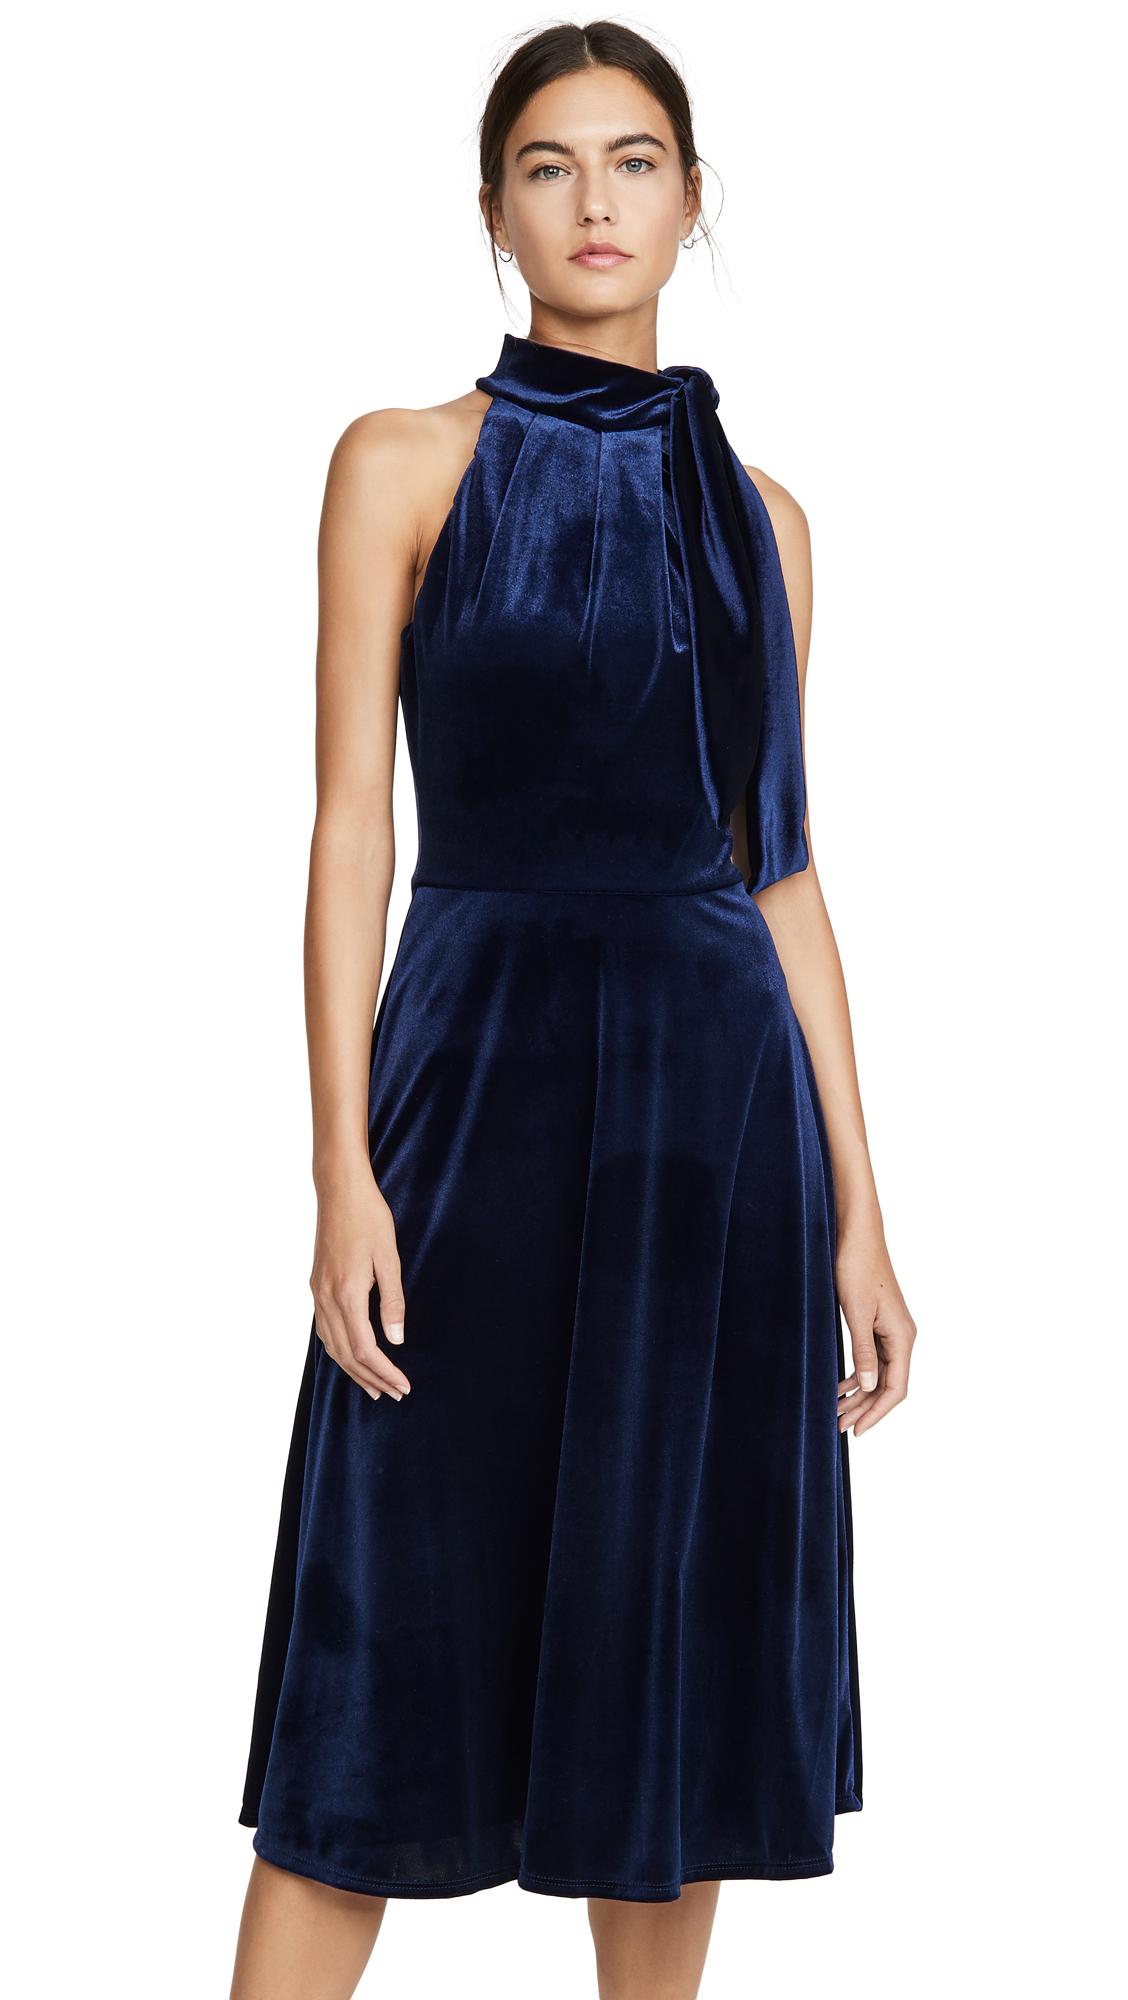 Black Halo Audrey Dress - 60% Off Sale